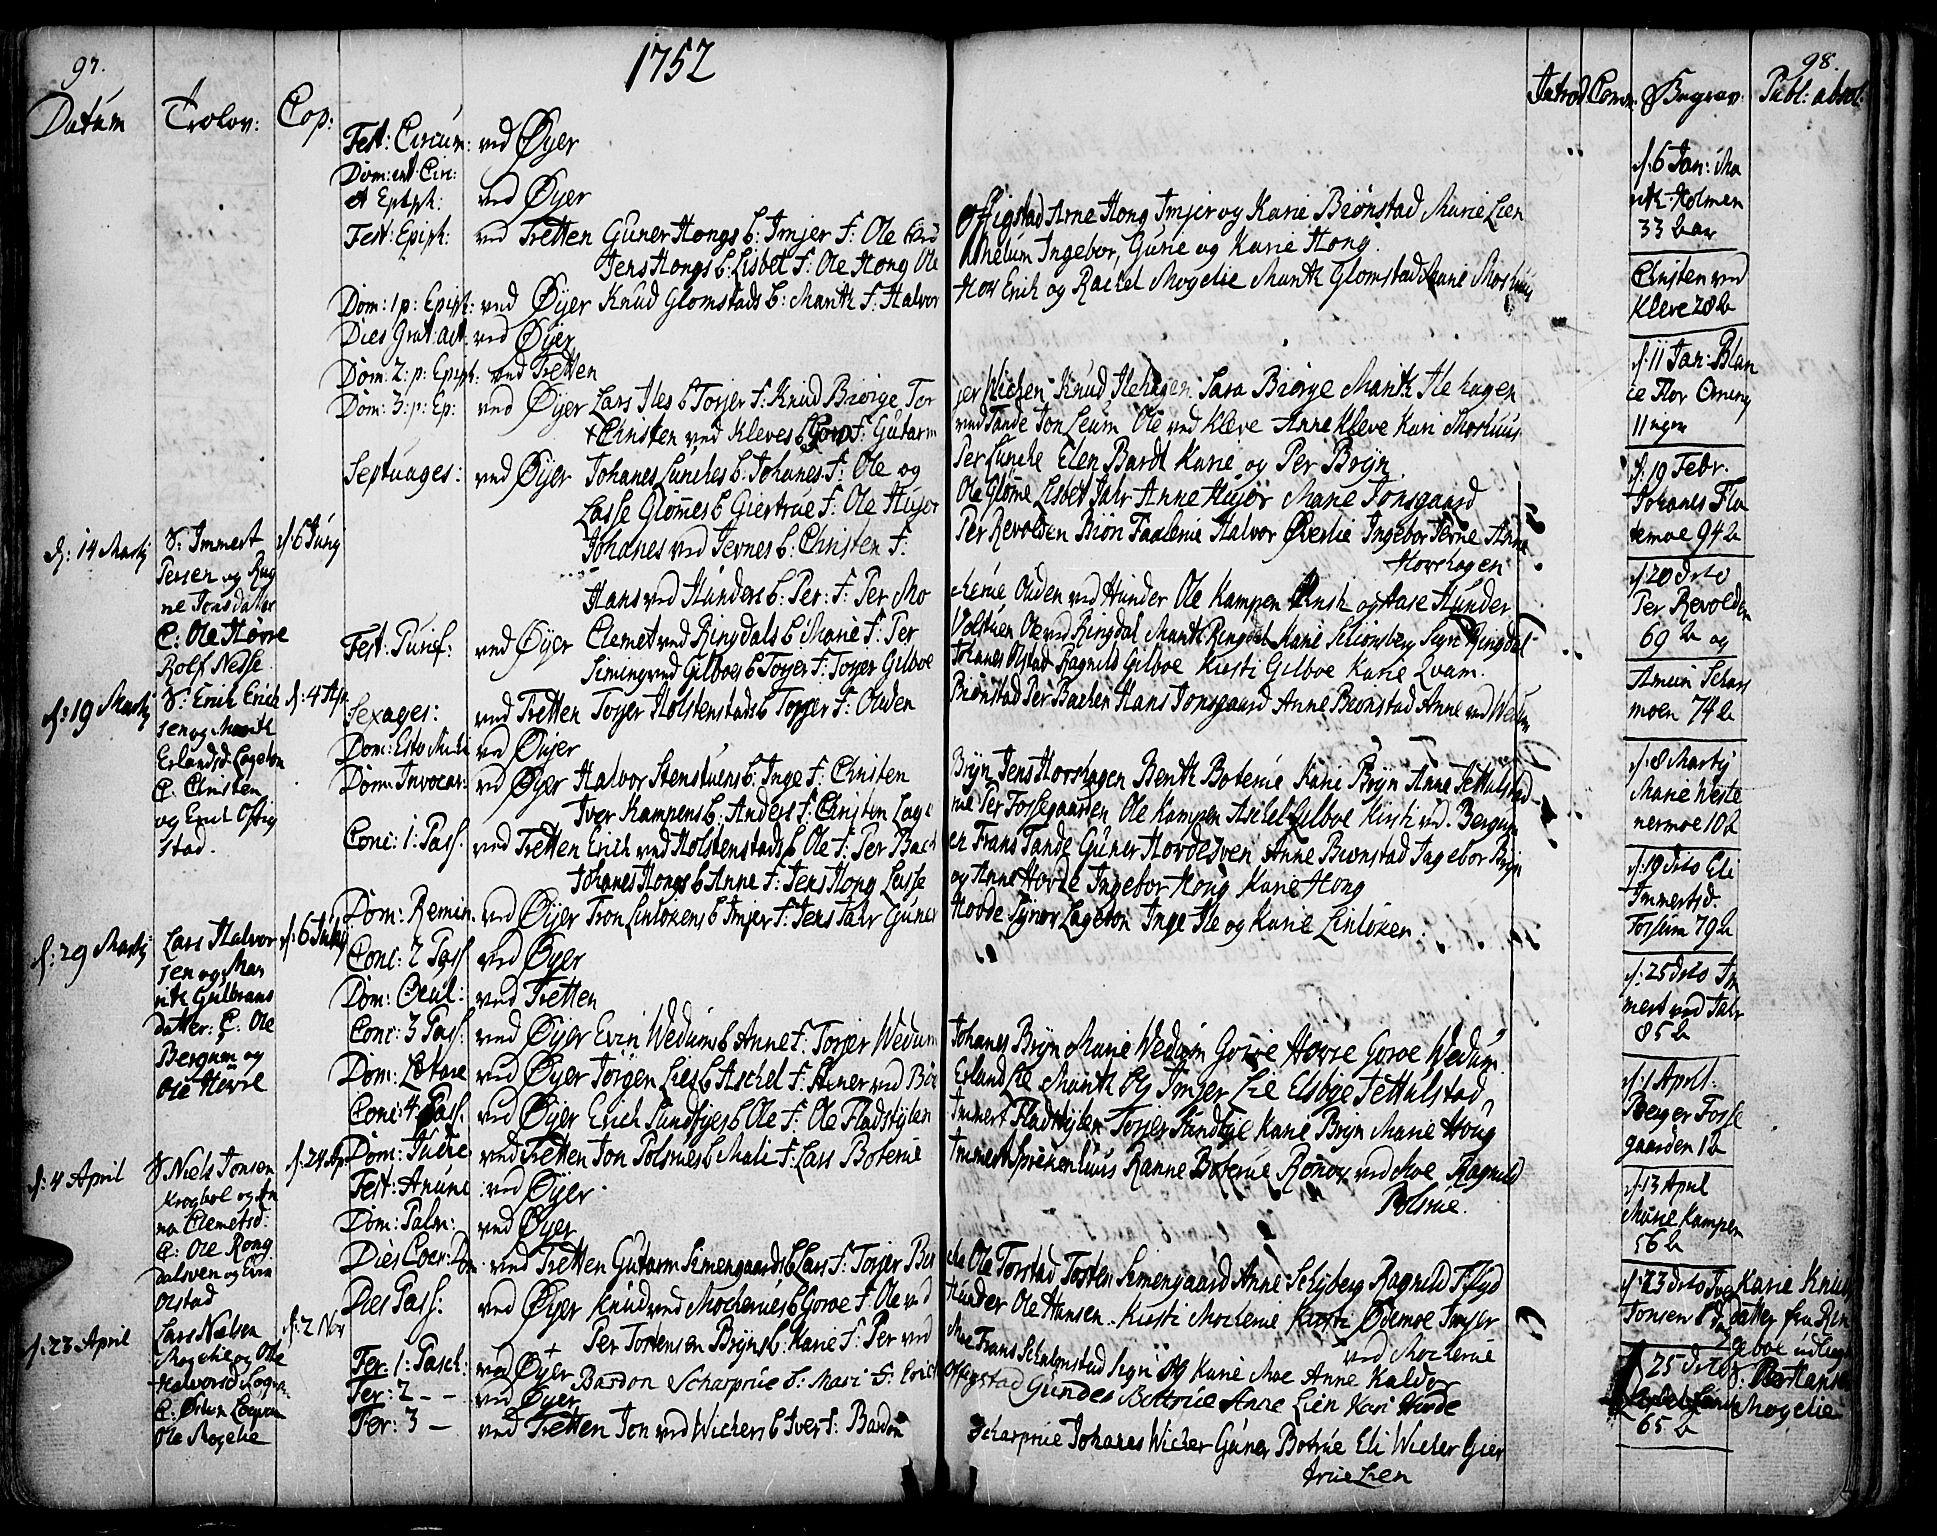 SAH, Øyer prestekontor, Ministerialbok nr. 2, 1733-1784, s. 97-98